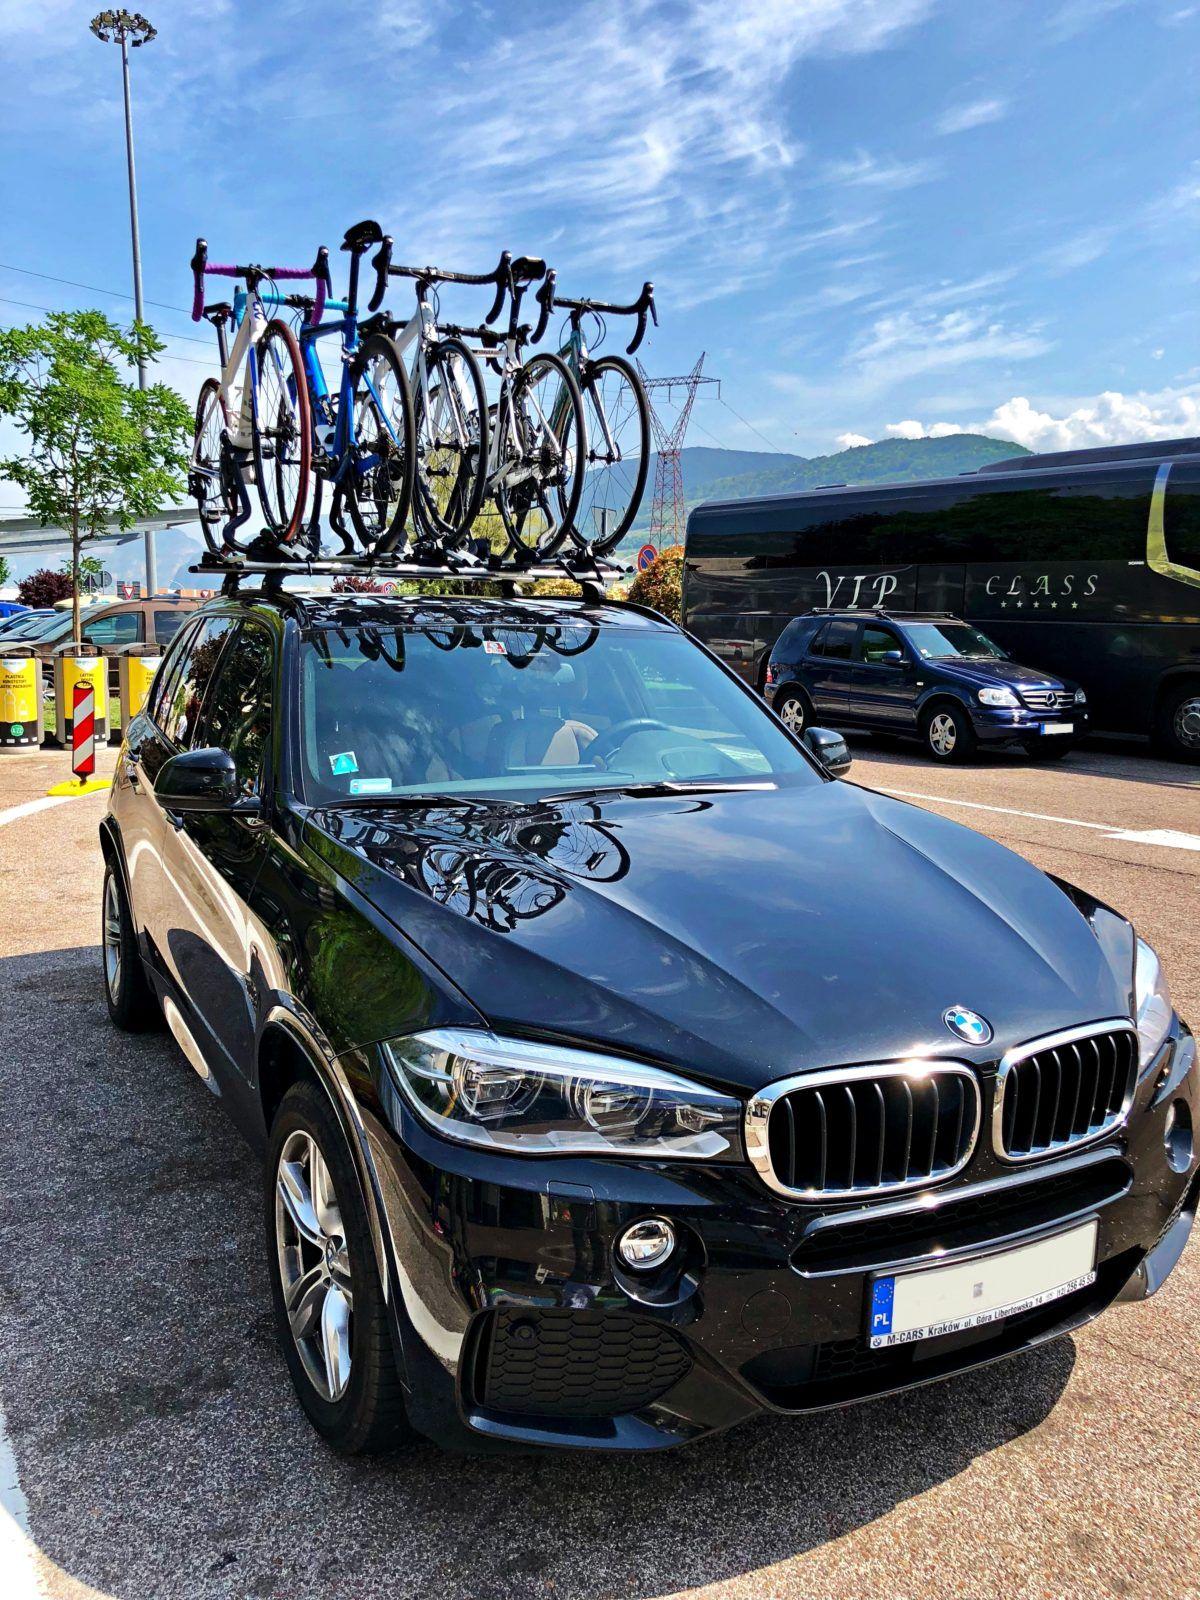 Bagażnik rowerowy na hak czy na dach?